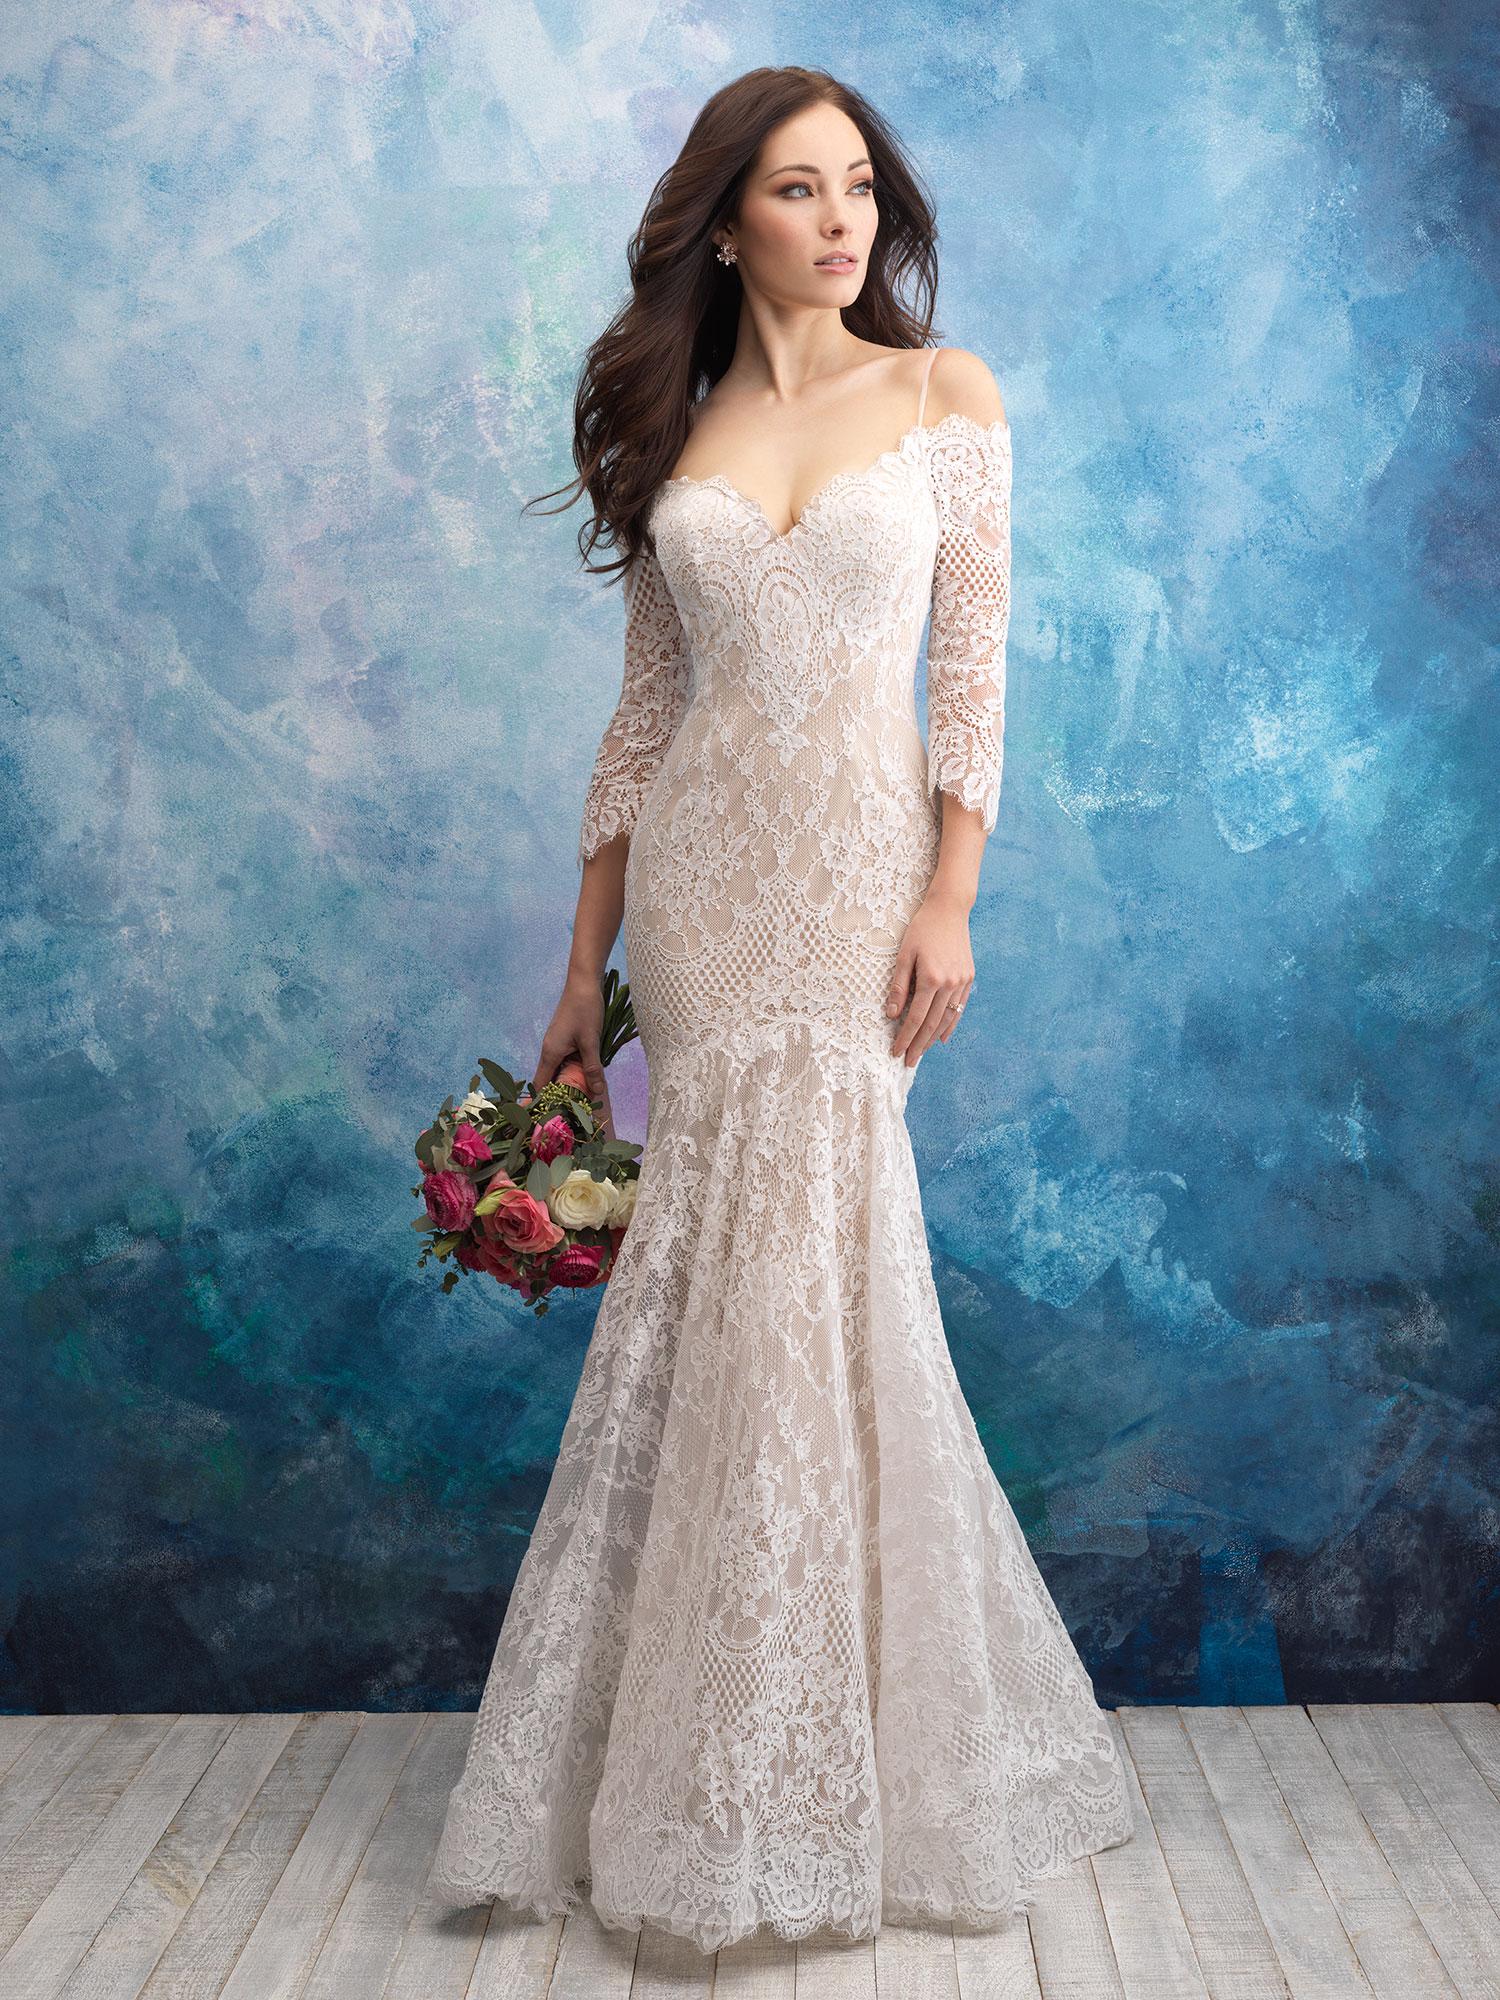 c01afe8d1b0 Allure 9551 - Couture Bridal